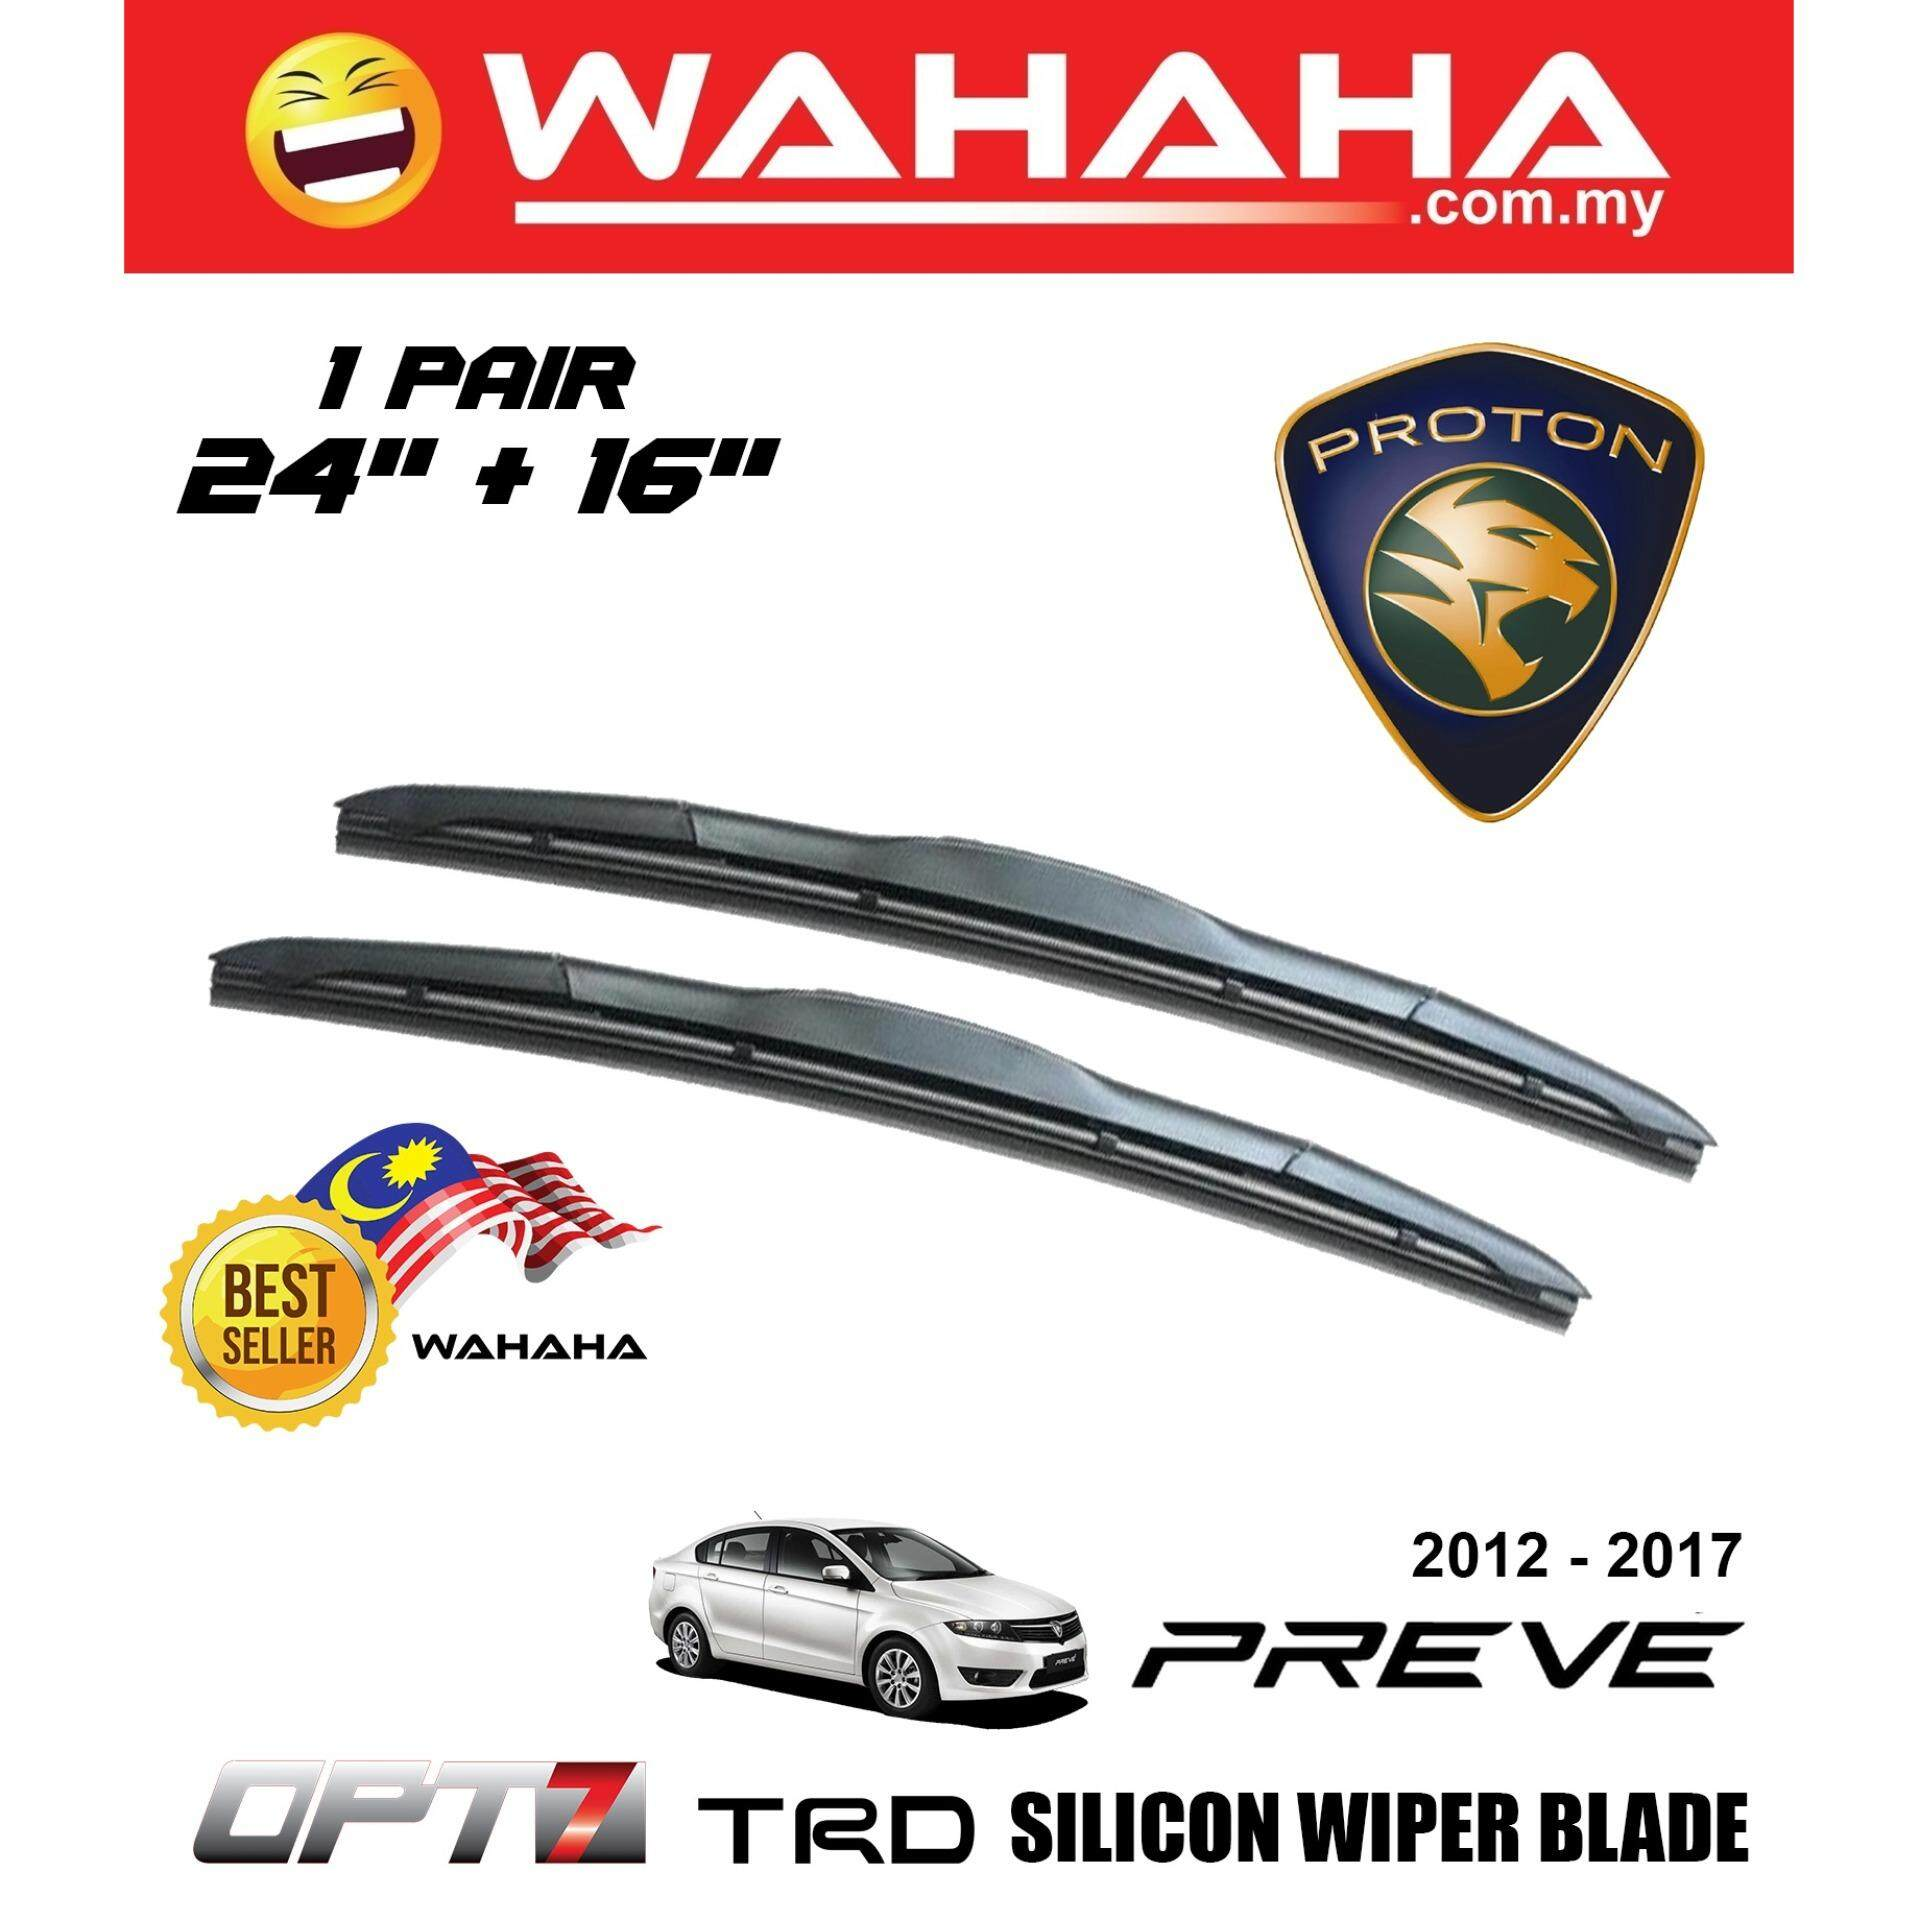 Proton Preve U 2012-2017 U Shape OPT7 Window Windshield TRD Silicon Wiper Blade 24  + 16  (1 Pair)